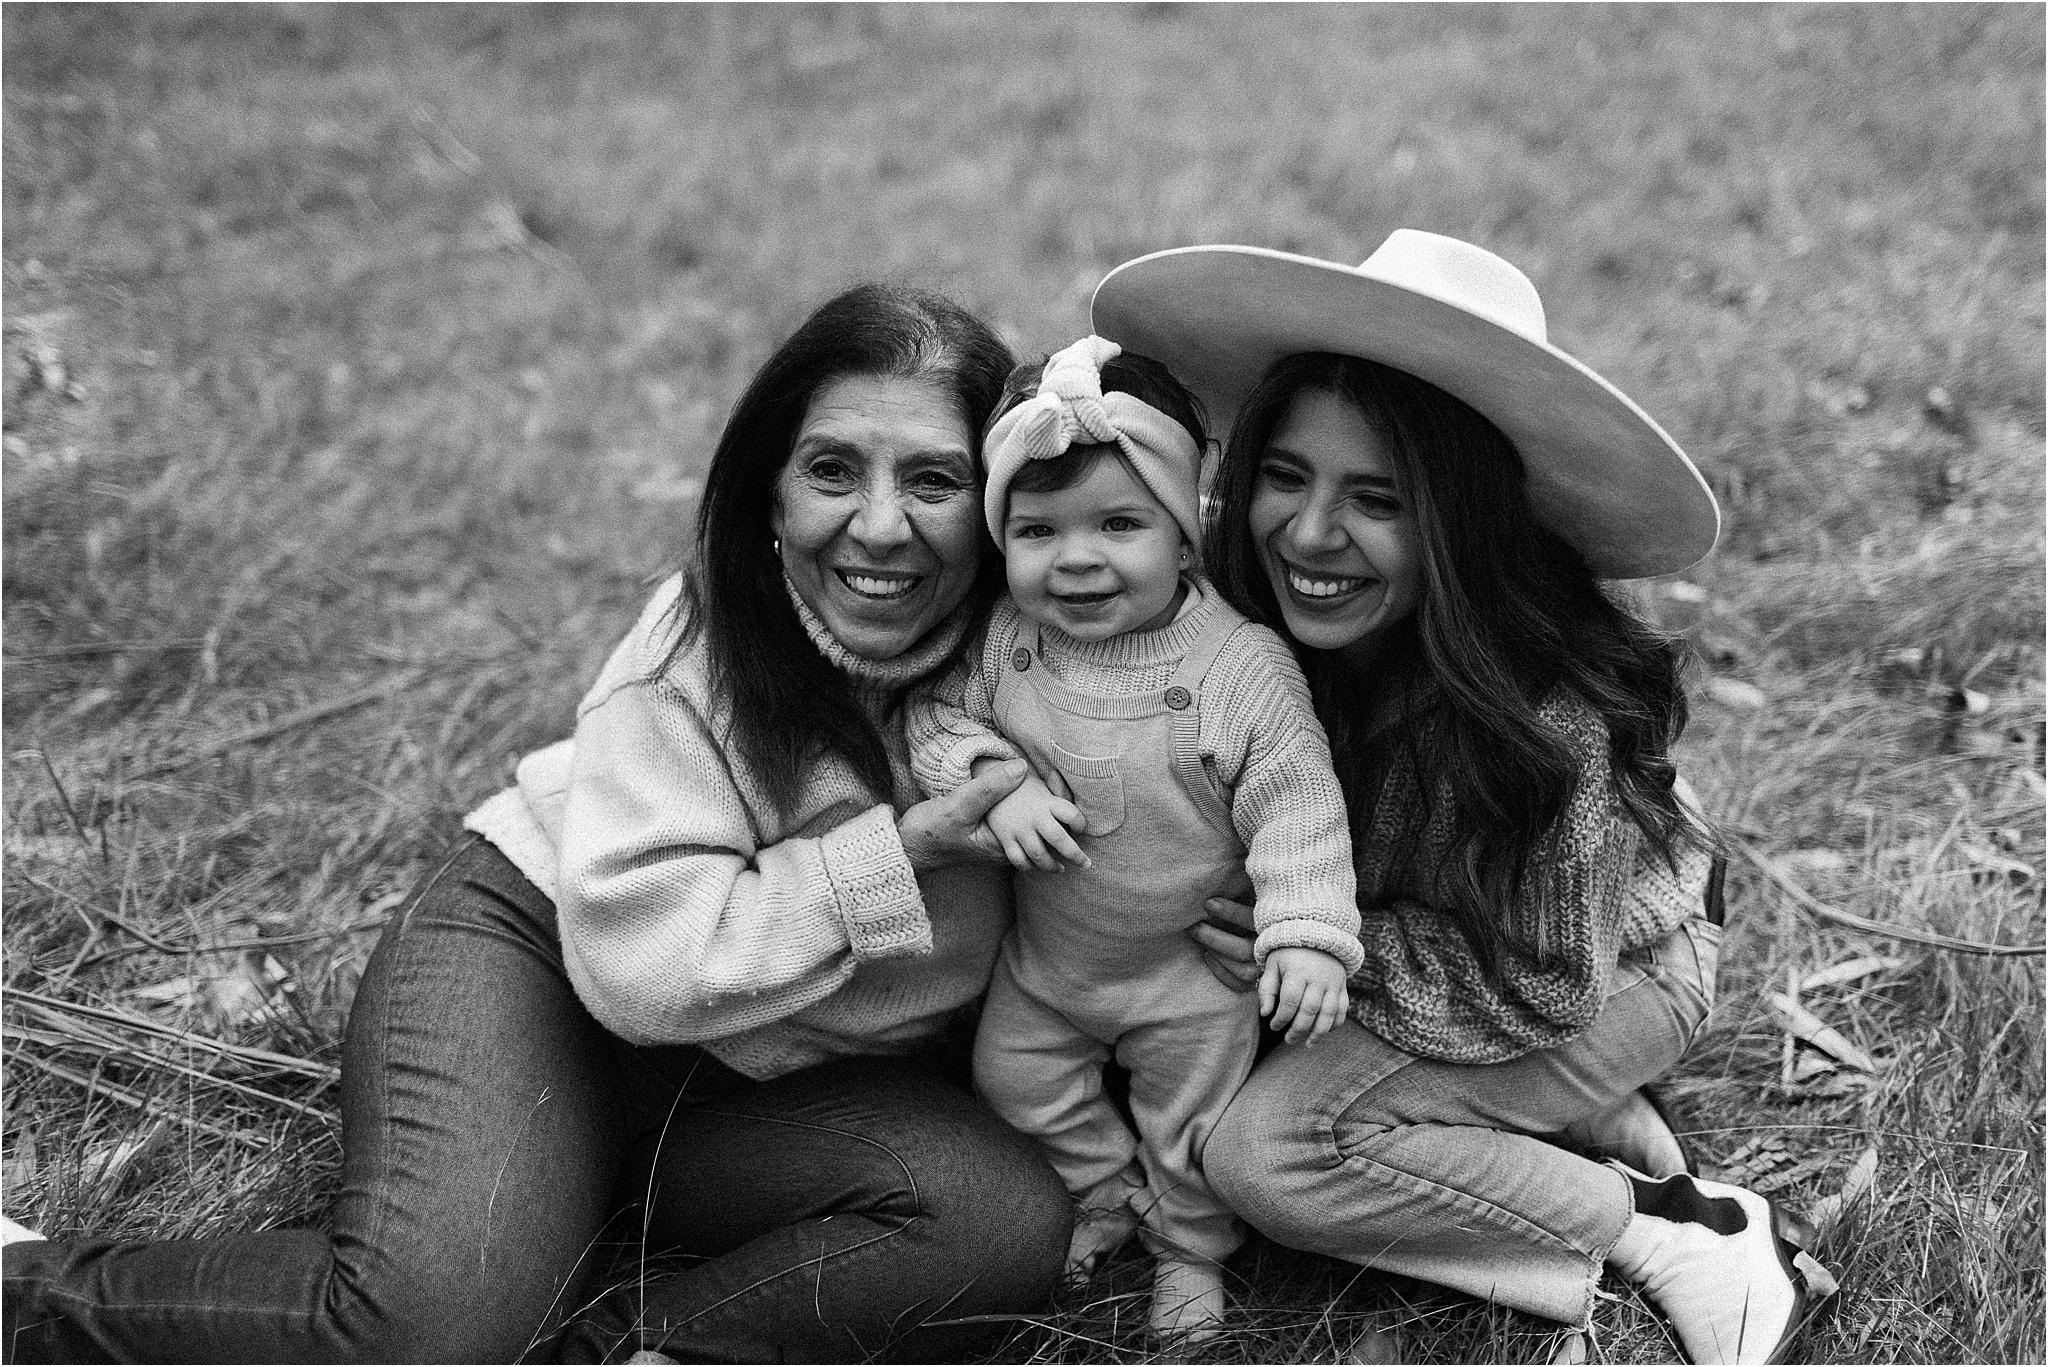 Mum, Grandma and toddler cuddling